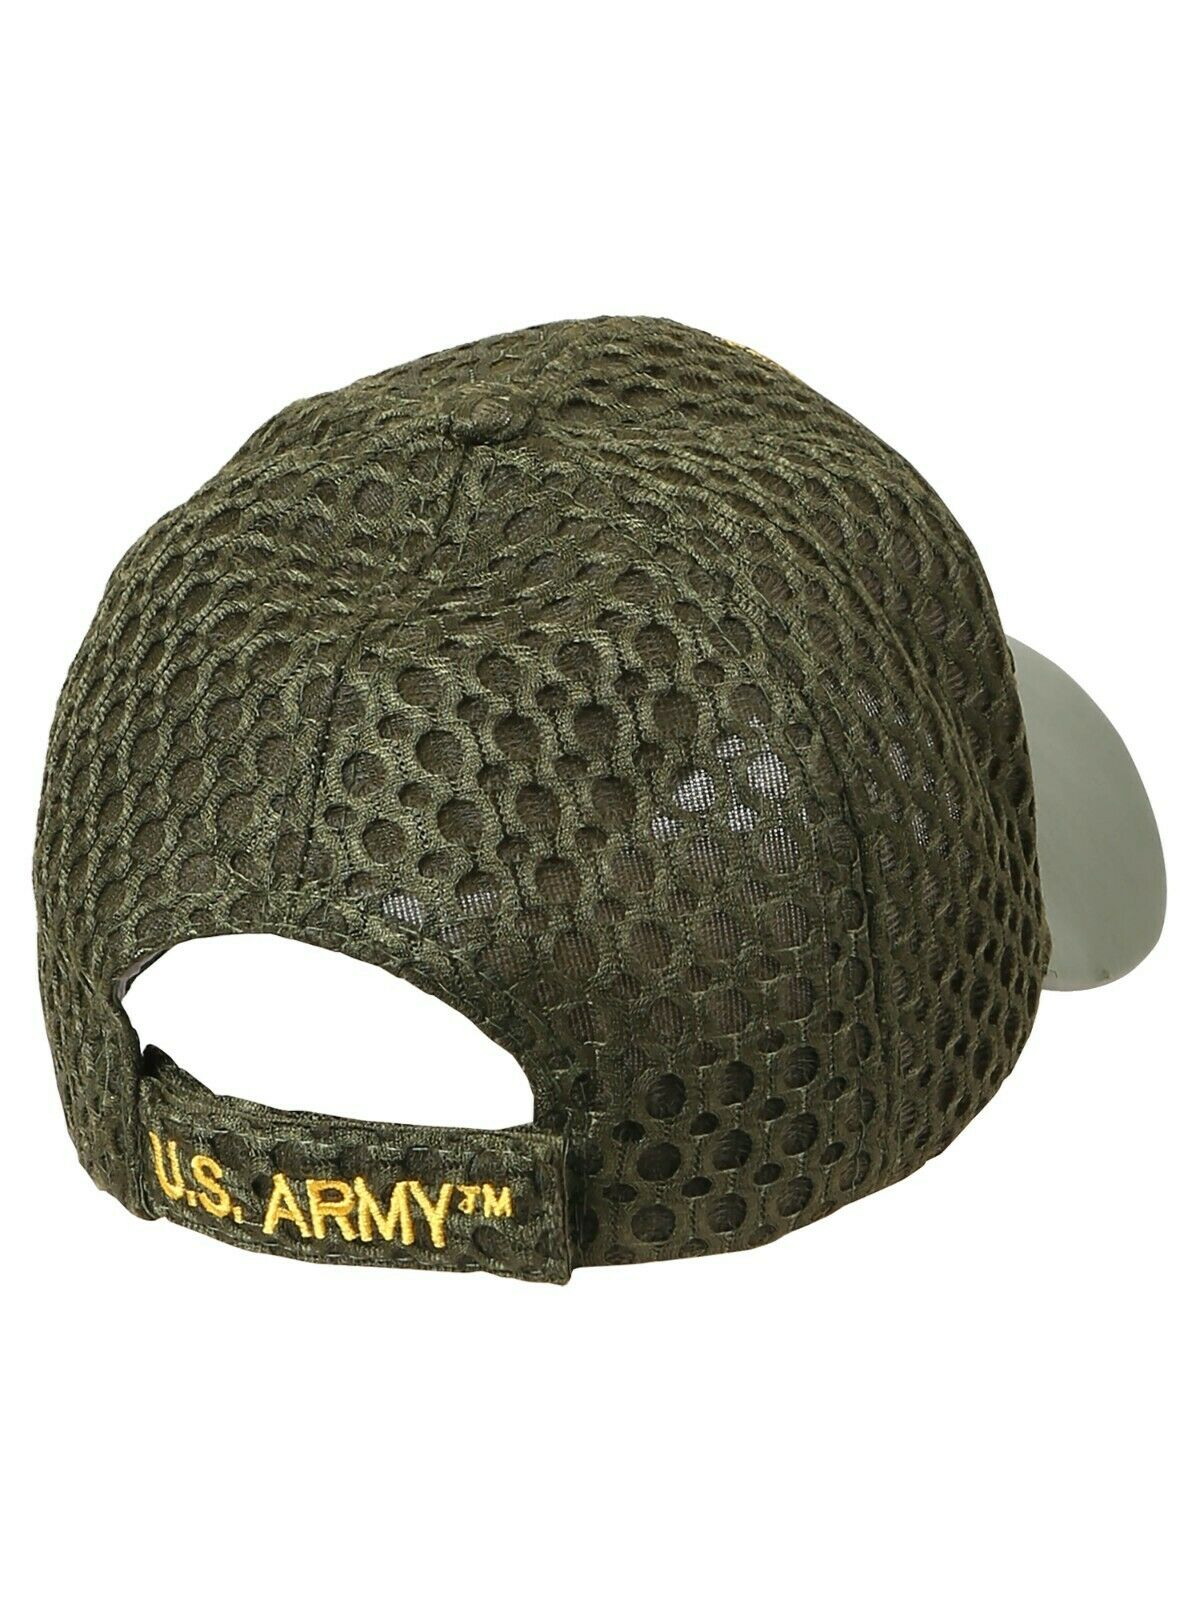 US Army Veteran Hats Military Cap Air Force Retired Vietnam War Disabled